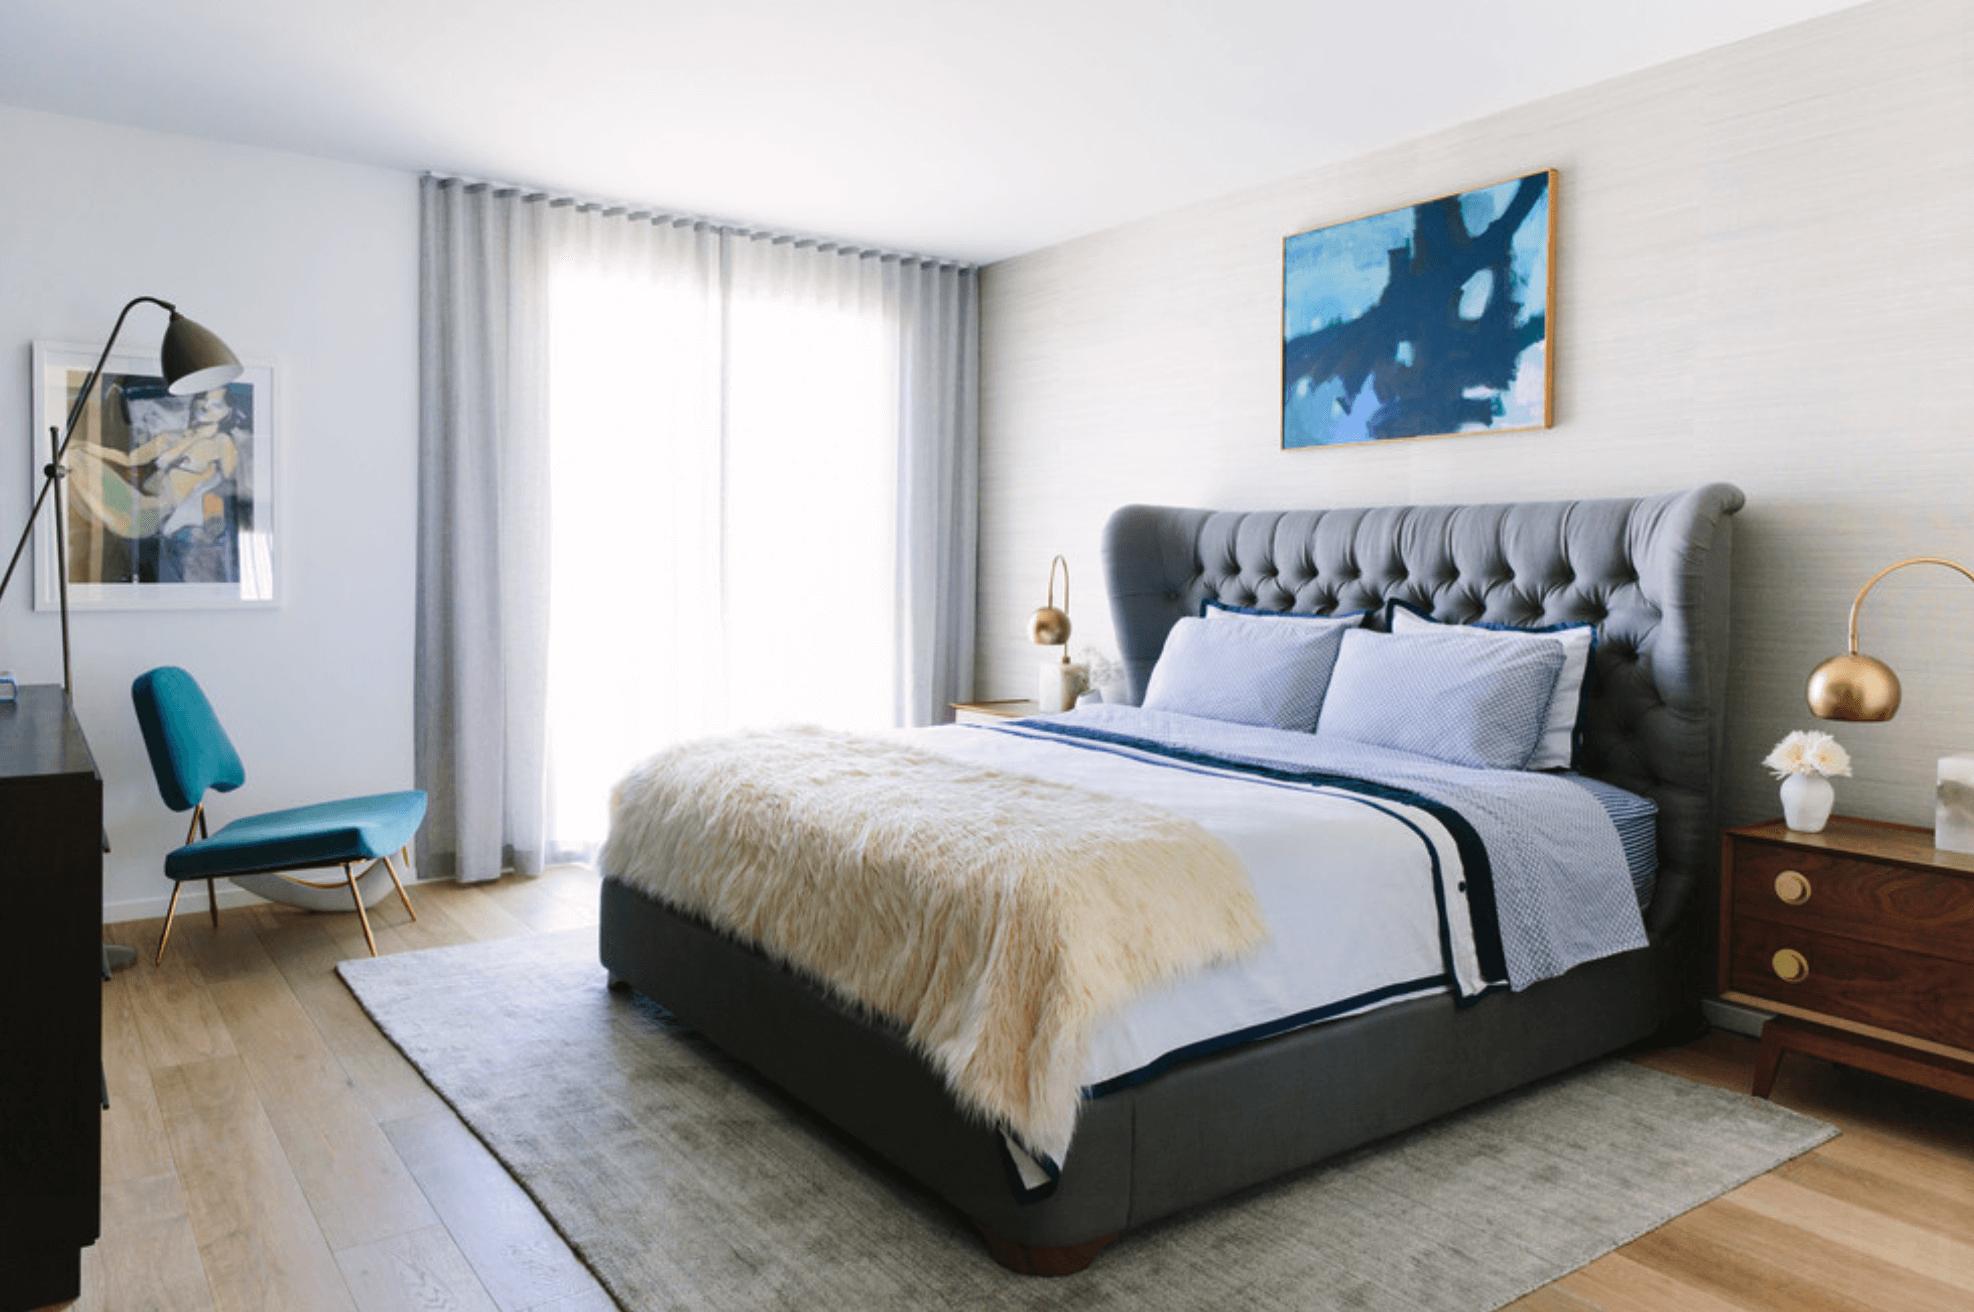 Quarto De Casal Decorado Simples Casa Pinterest Quarto De  ~ Decoração De Quarto De Casal Simples E Bonito